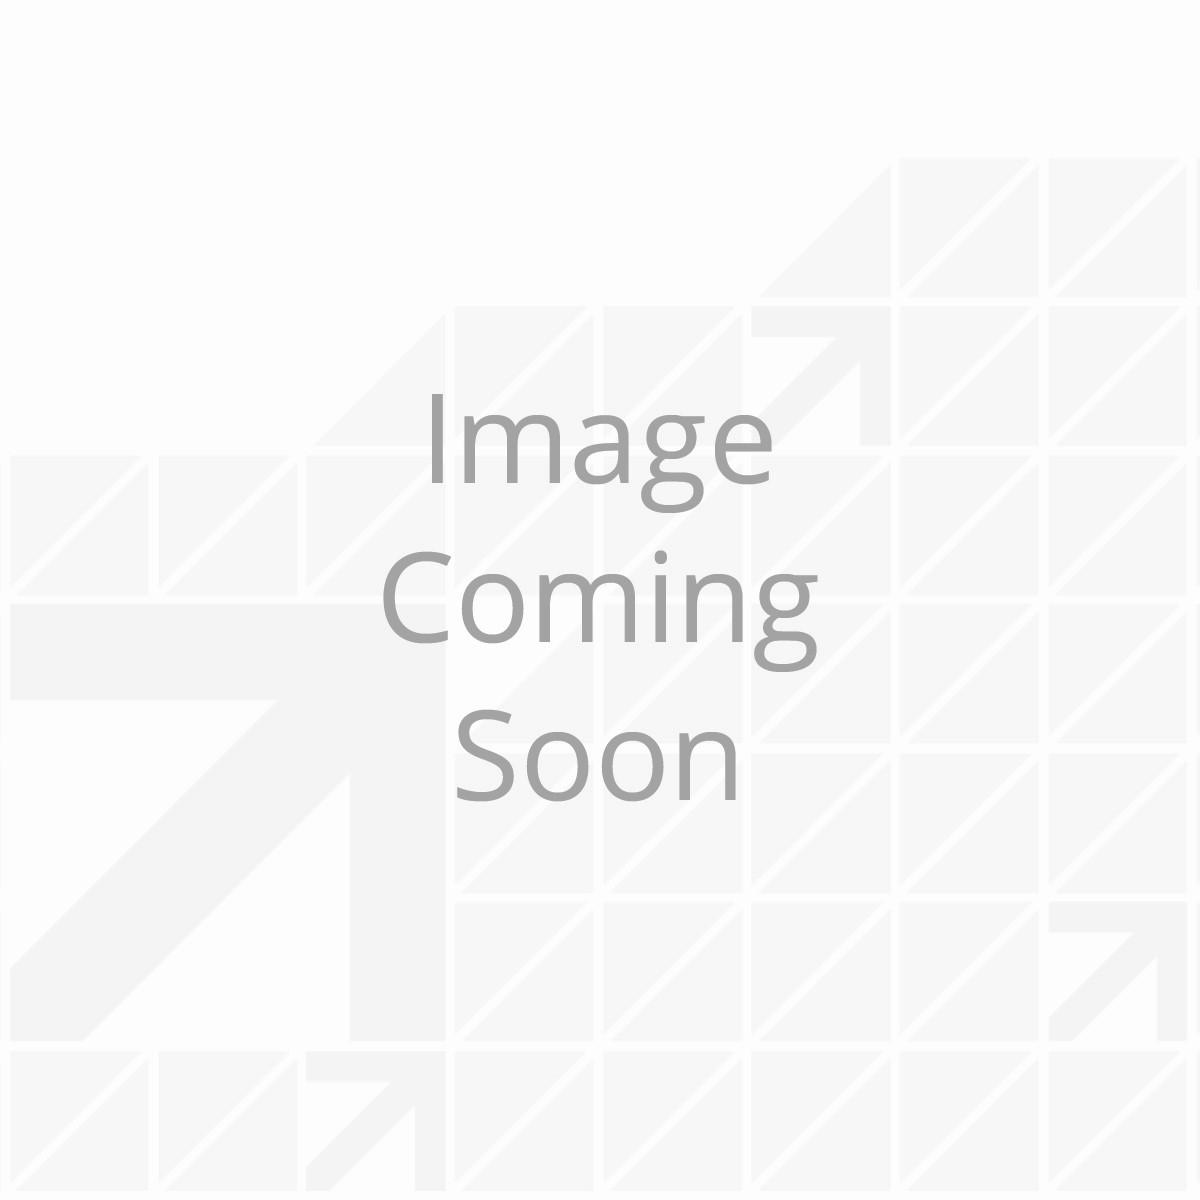 161394_Motorized-Solenoid_001